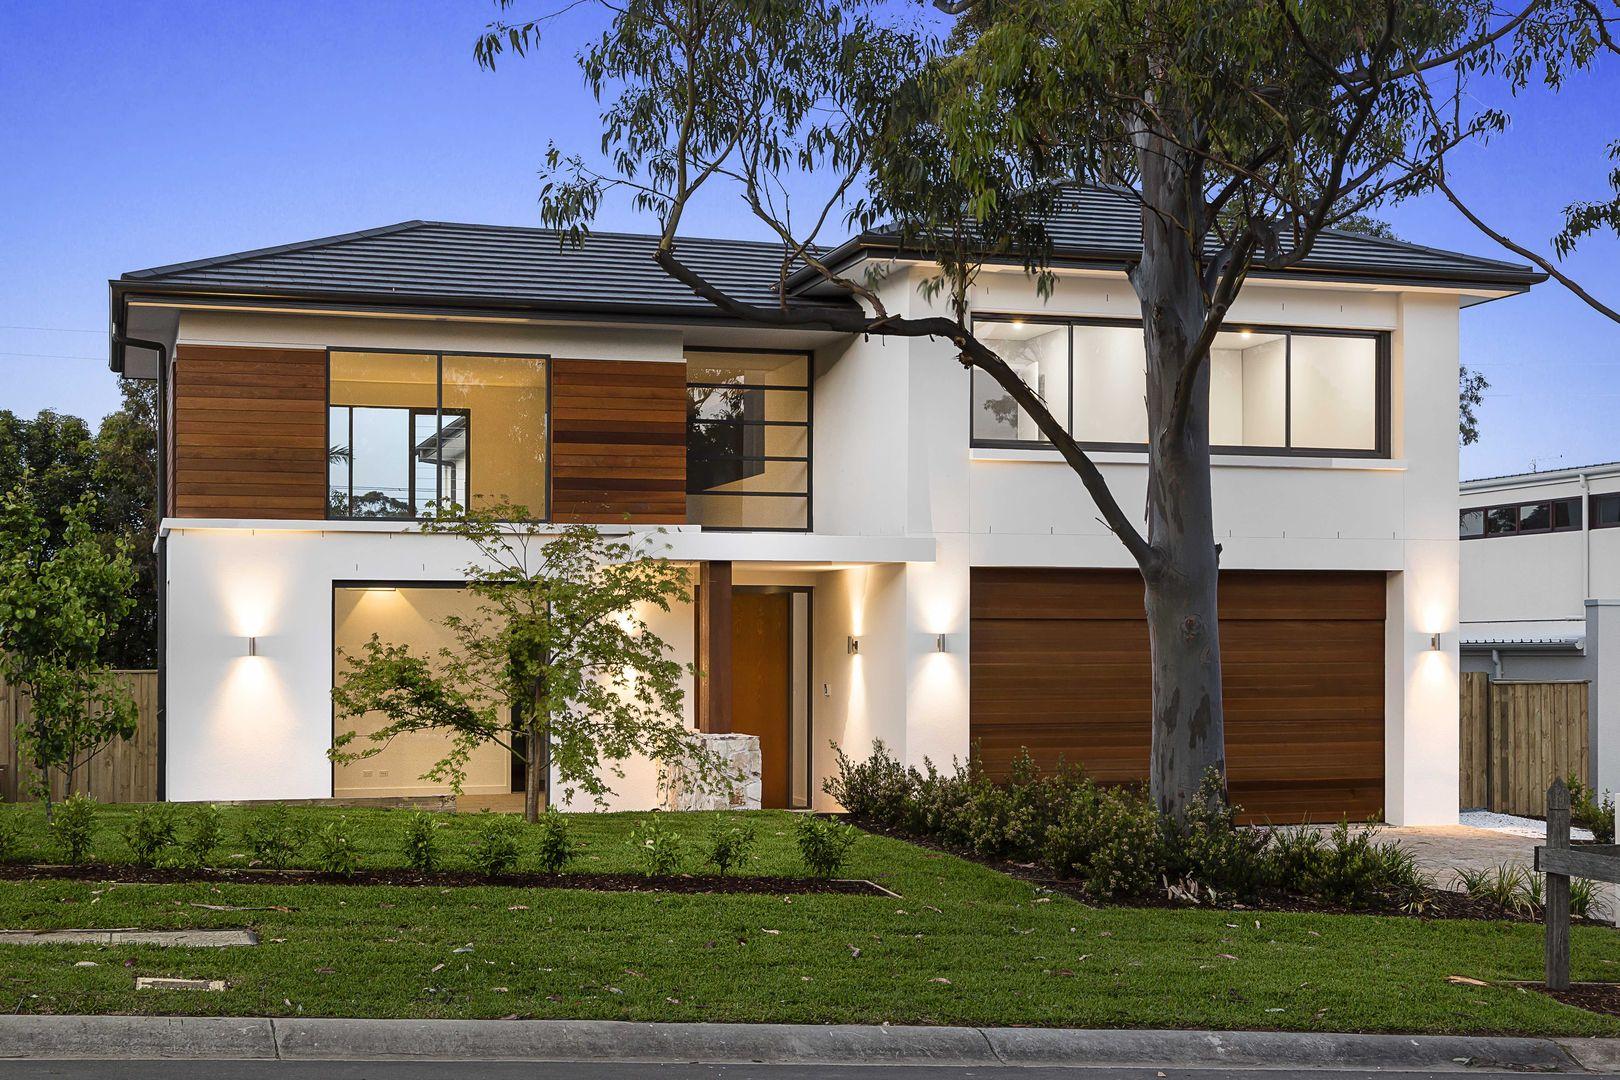 414-418B Bobbin Head Road, Turramurra, NSW 2074, Image 0